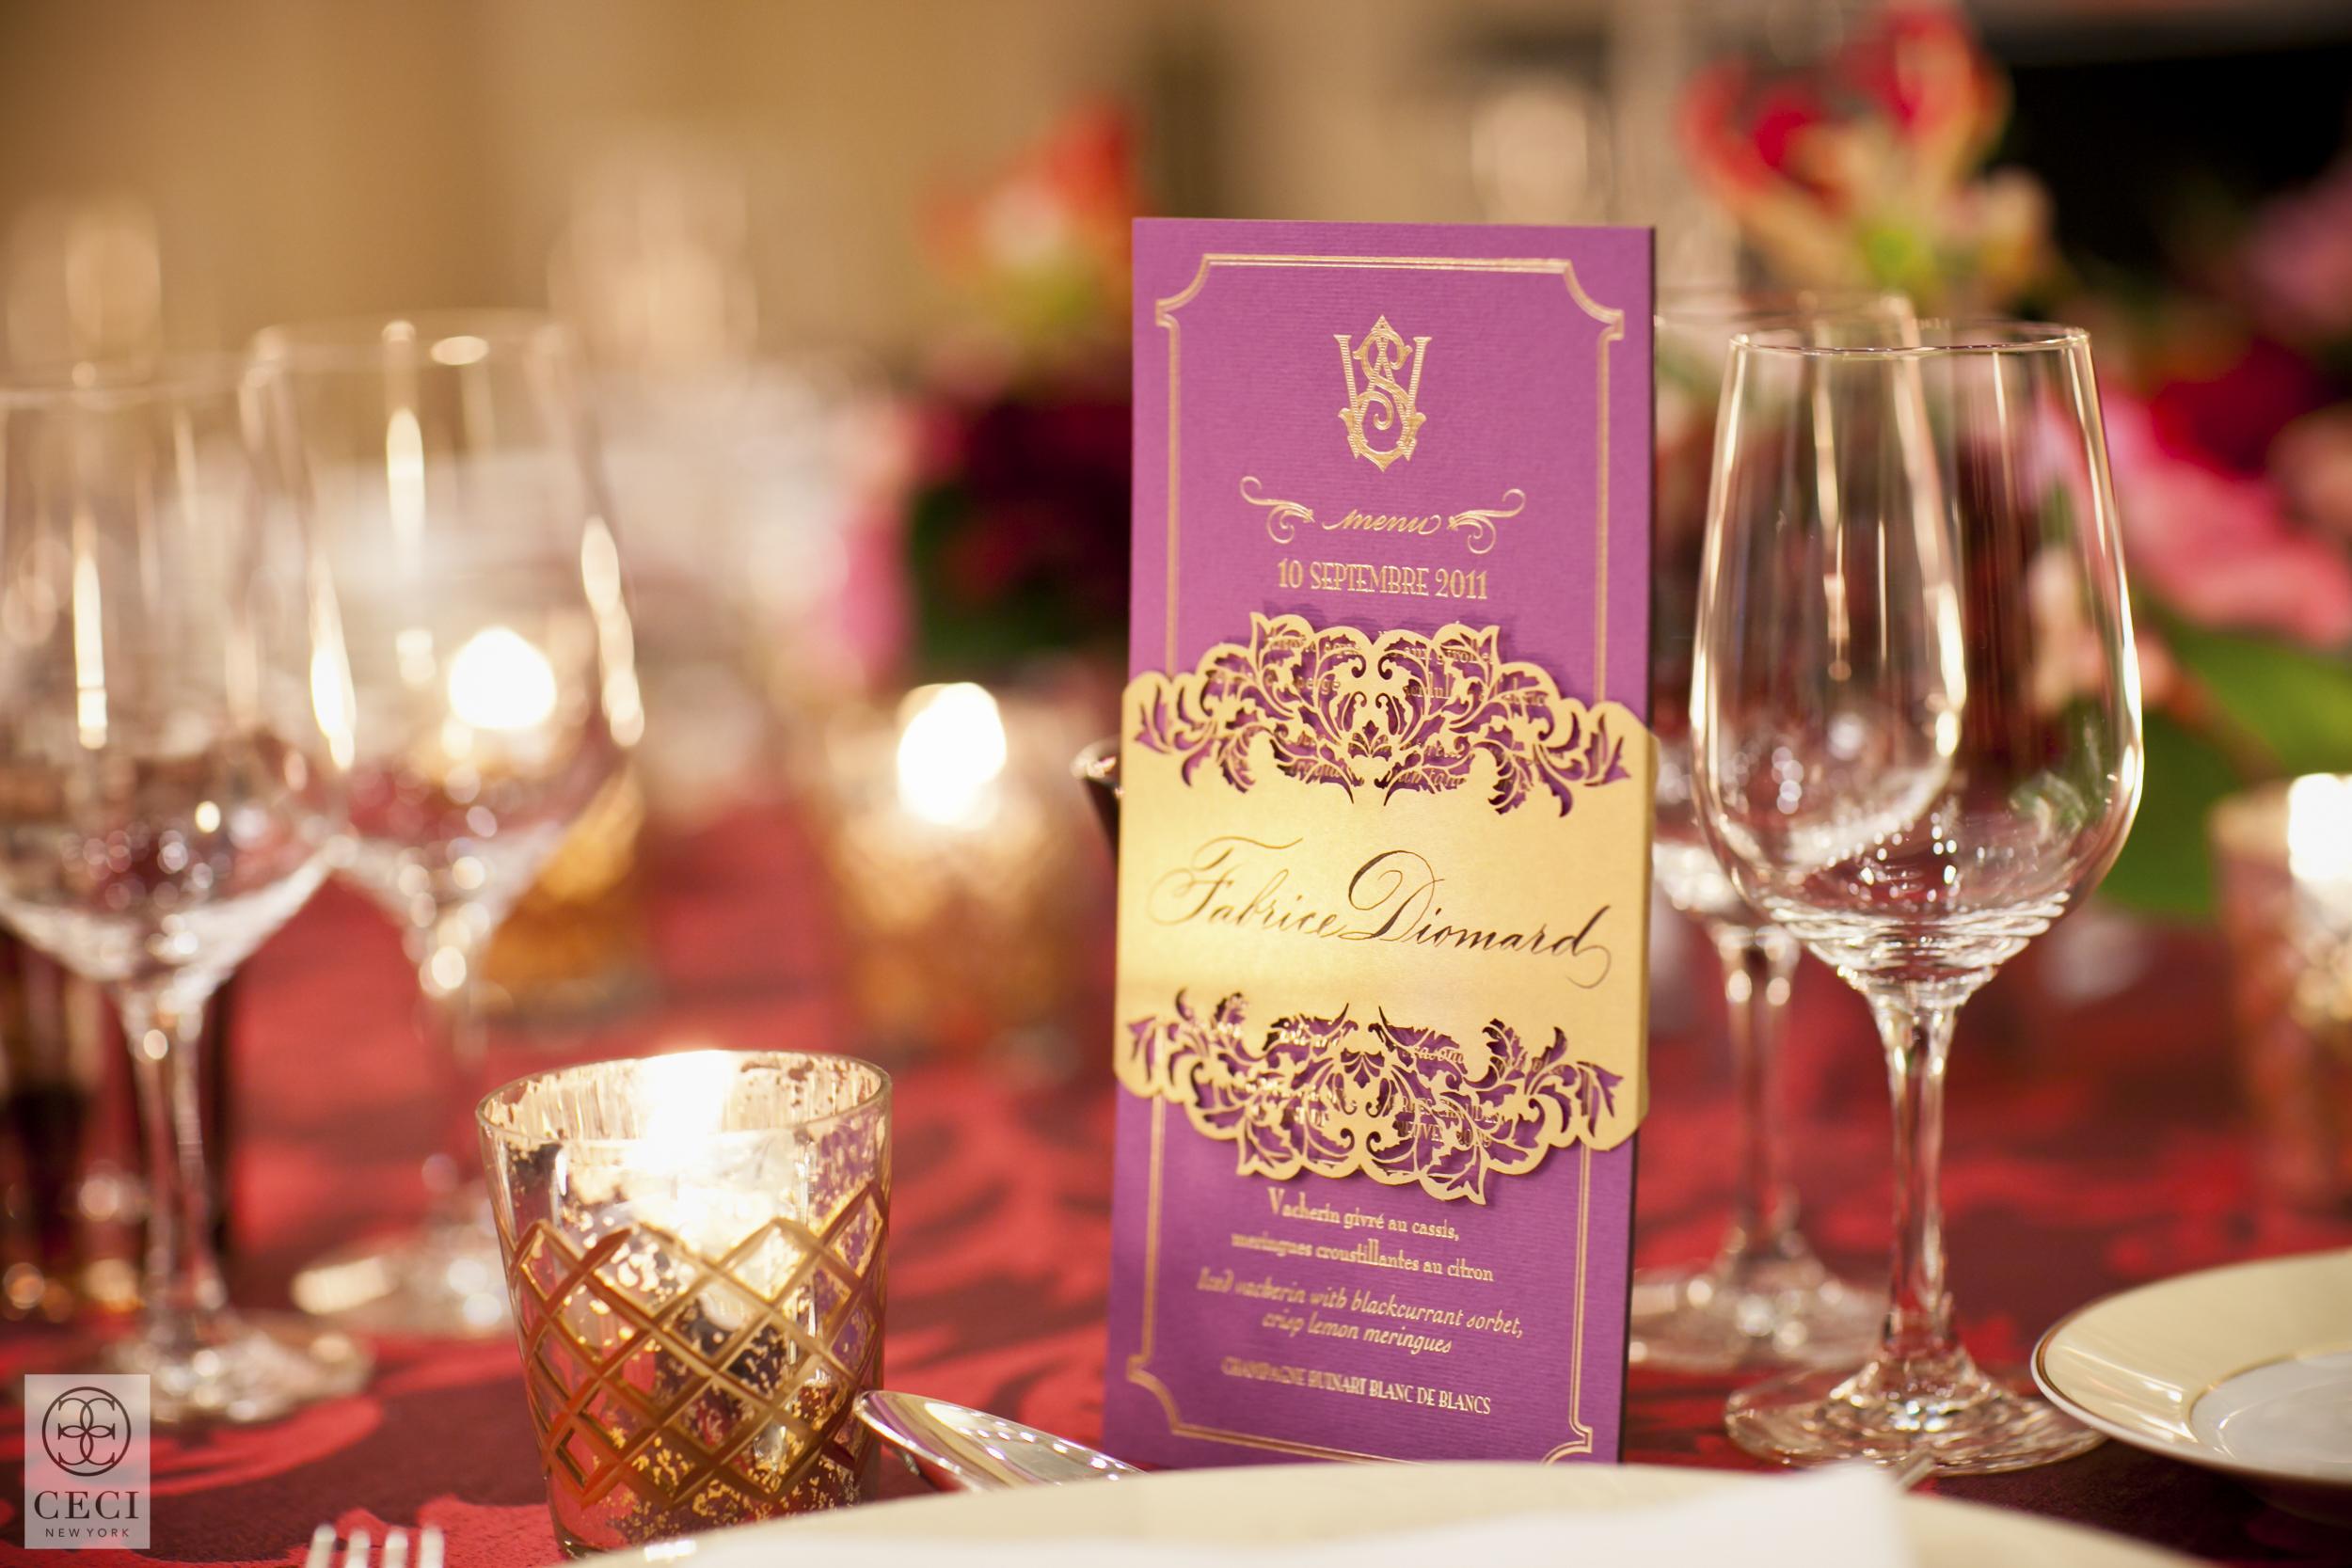 ceci_new_york_lucas_somoza_purple_regal_wediding_birthday_commitment_ceremony_invitation_logo_branding_perfume_gold_-6.jpg